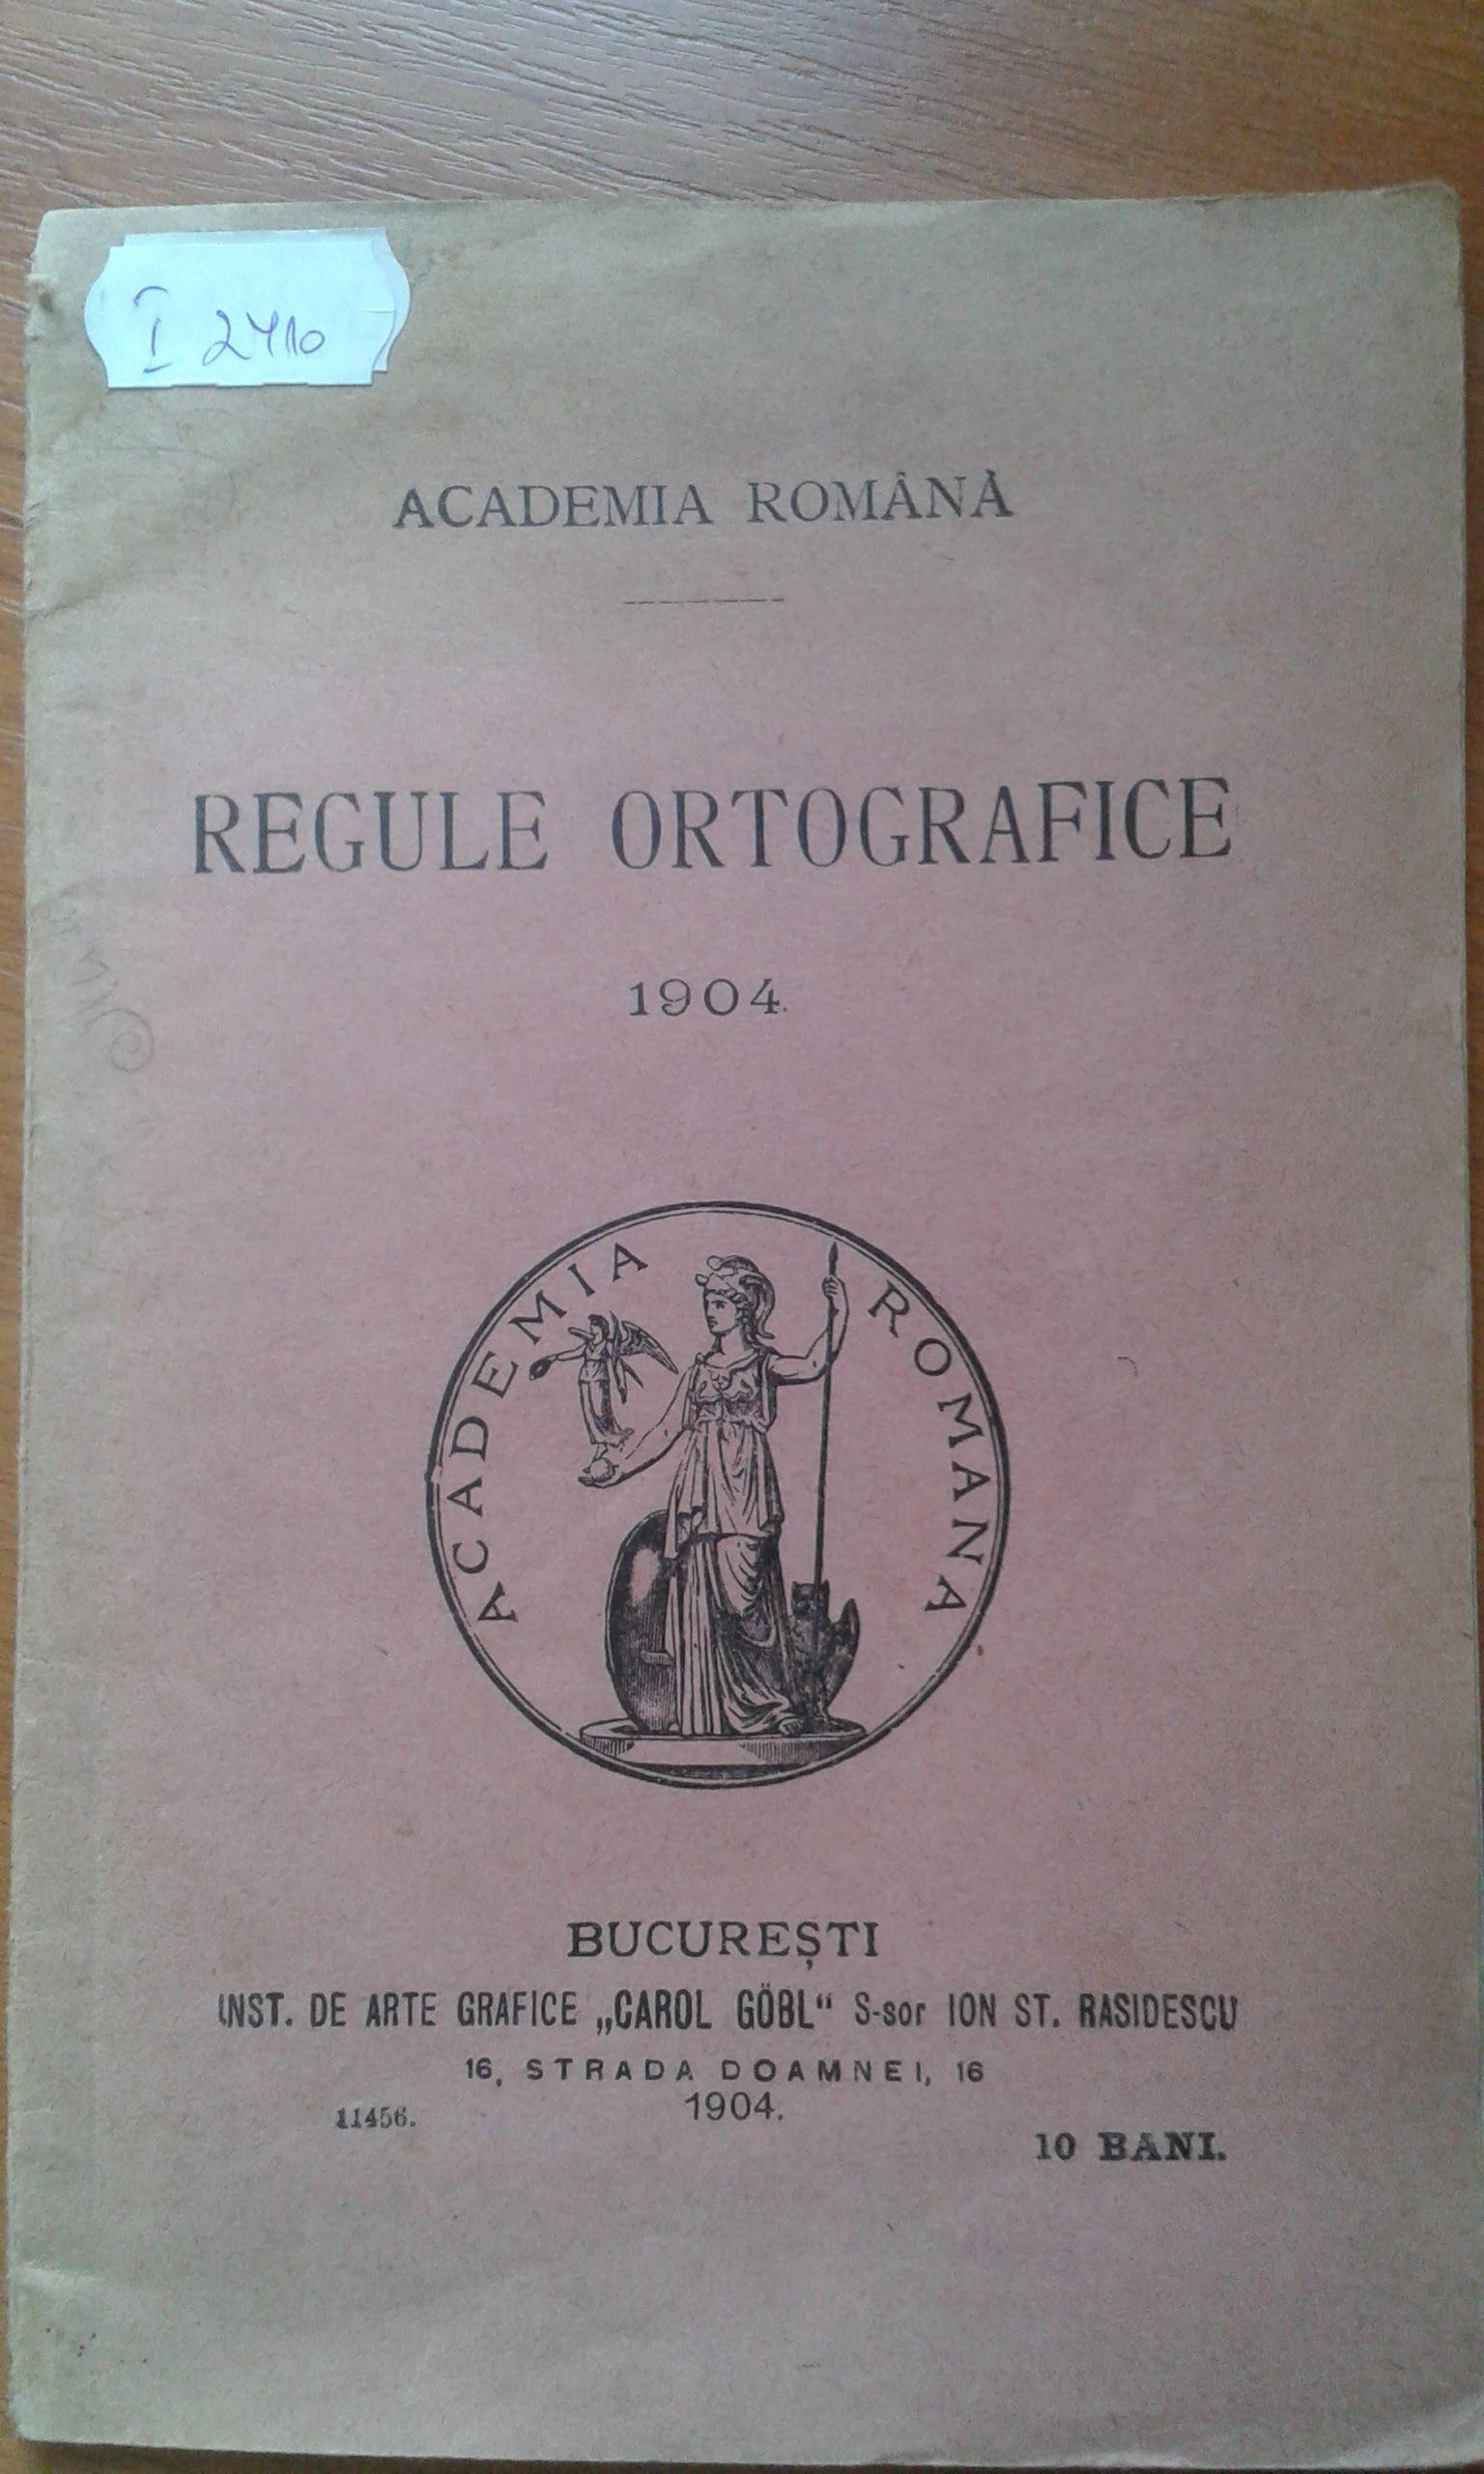 1904 - Regule ortografice (1).jpg